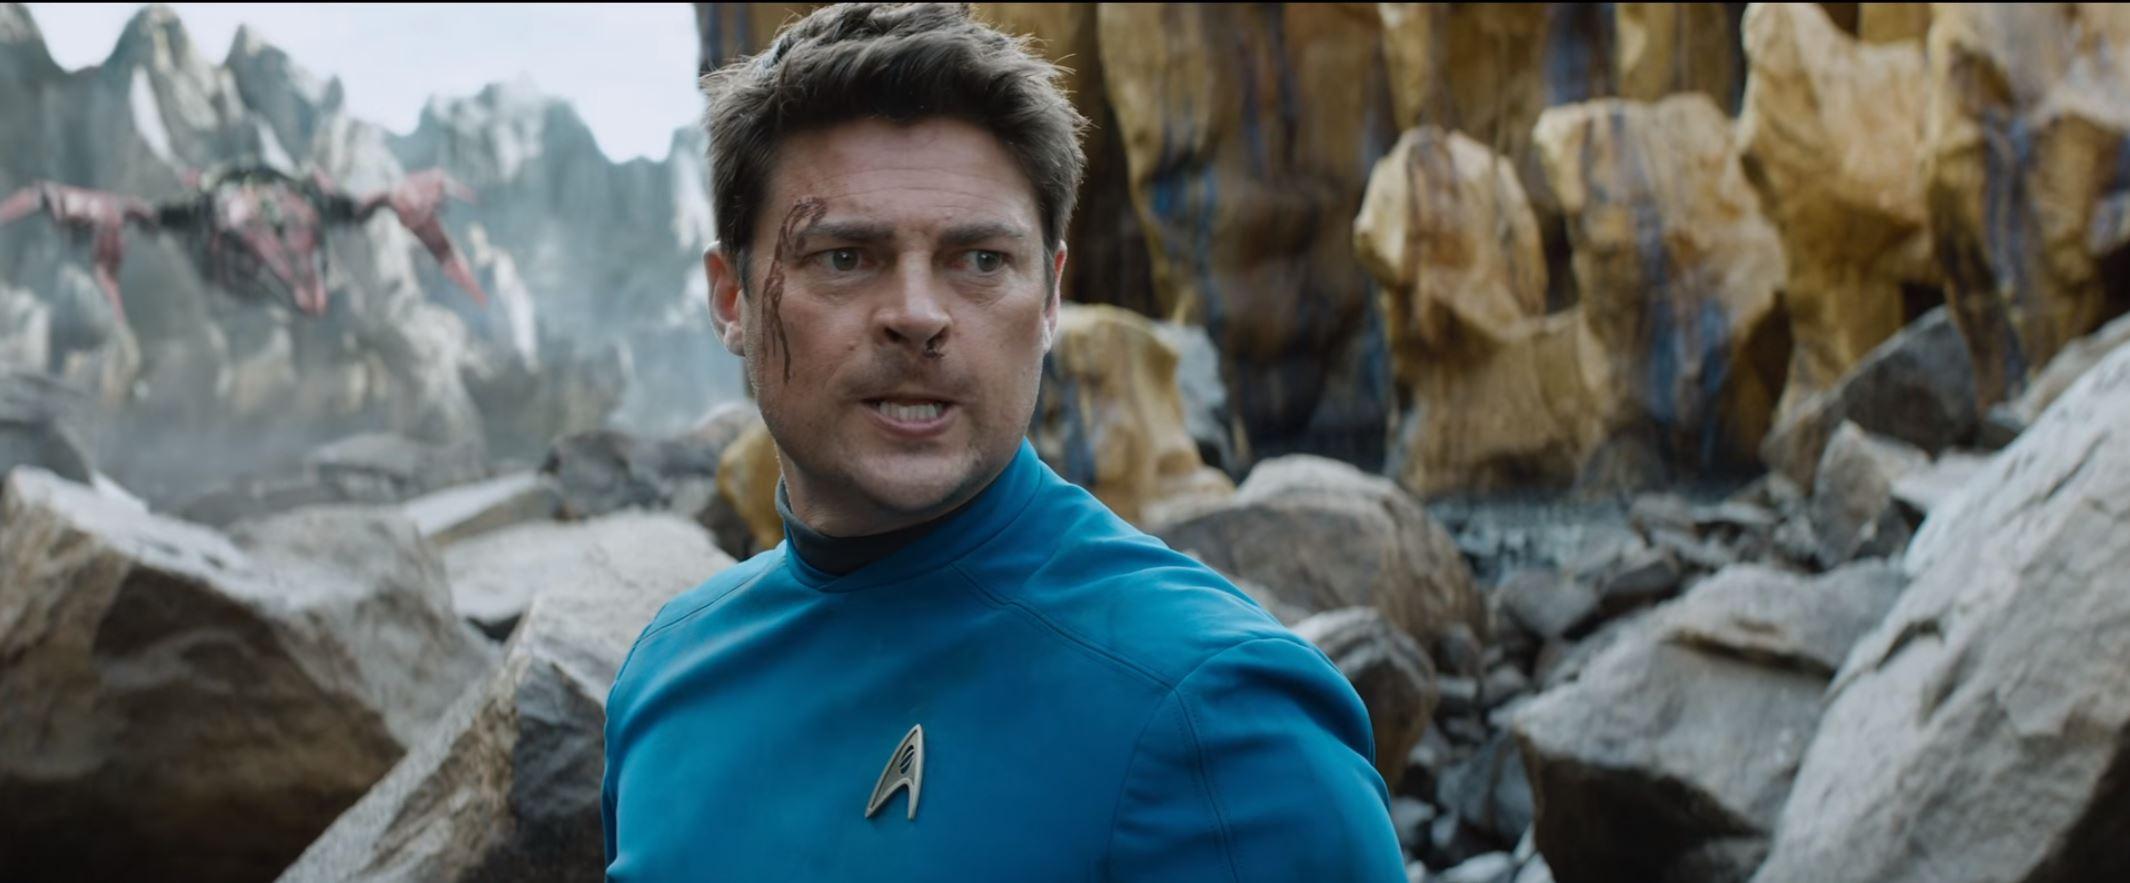 Watch The New Star Trek Beyond Trailer!